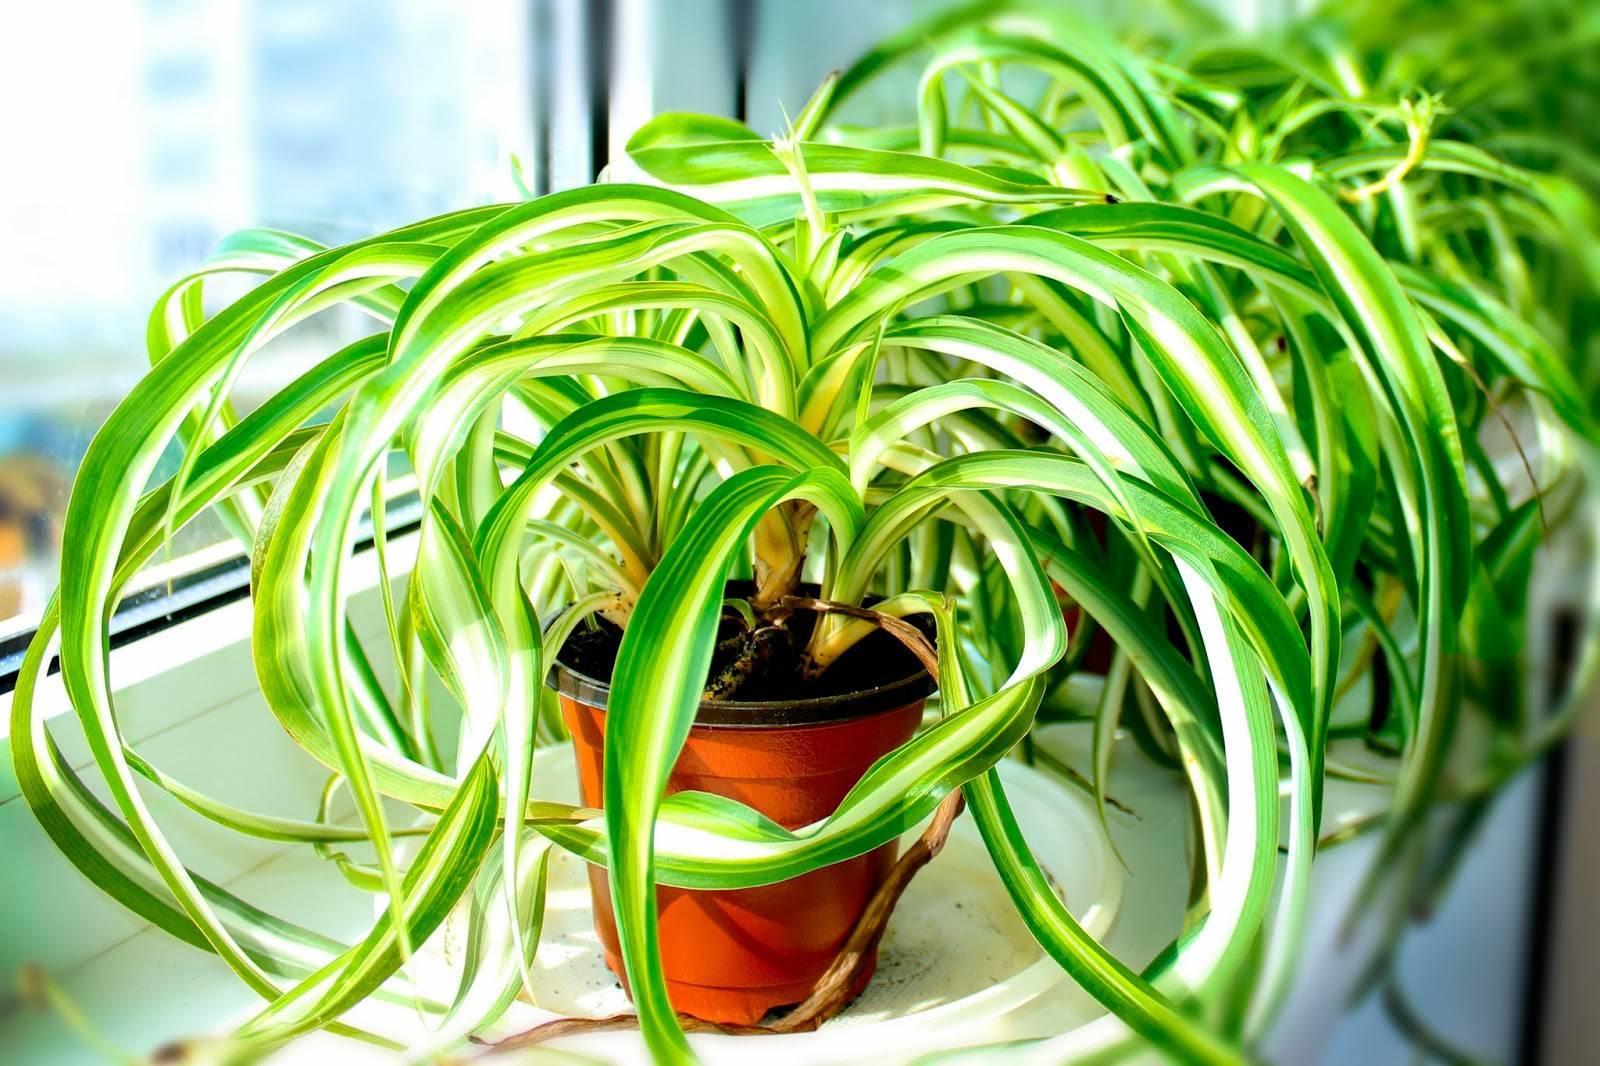 Хлорофитум: уход в домашних условиях, размножение, описание и фото